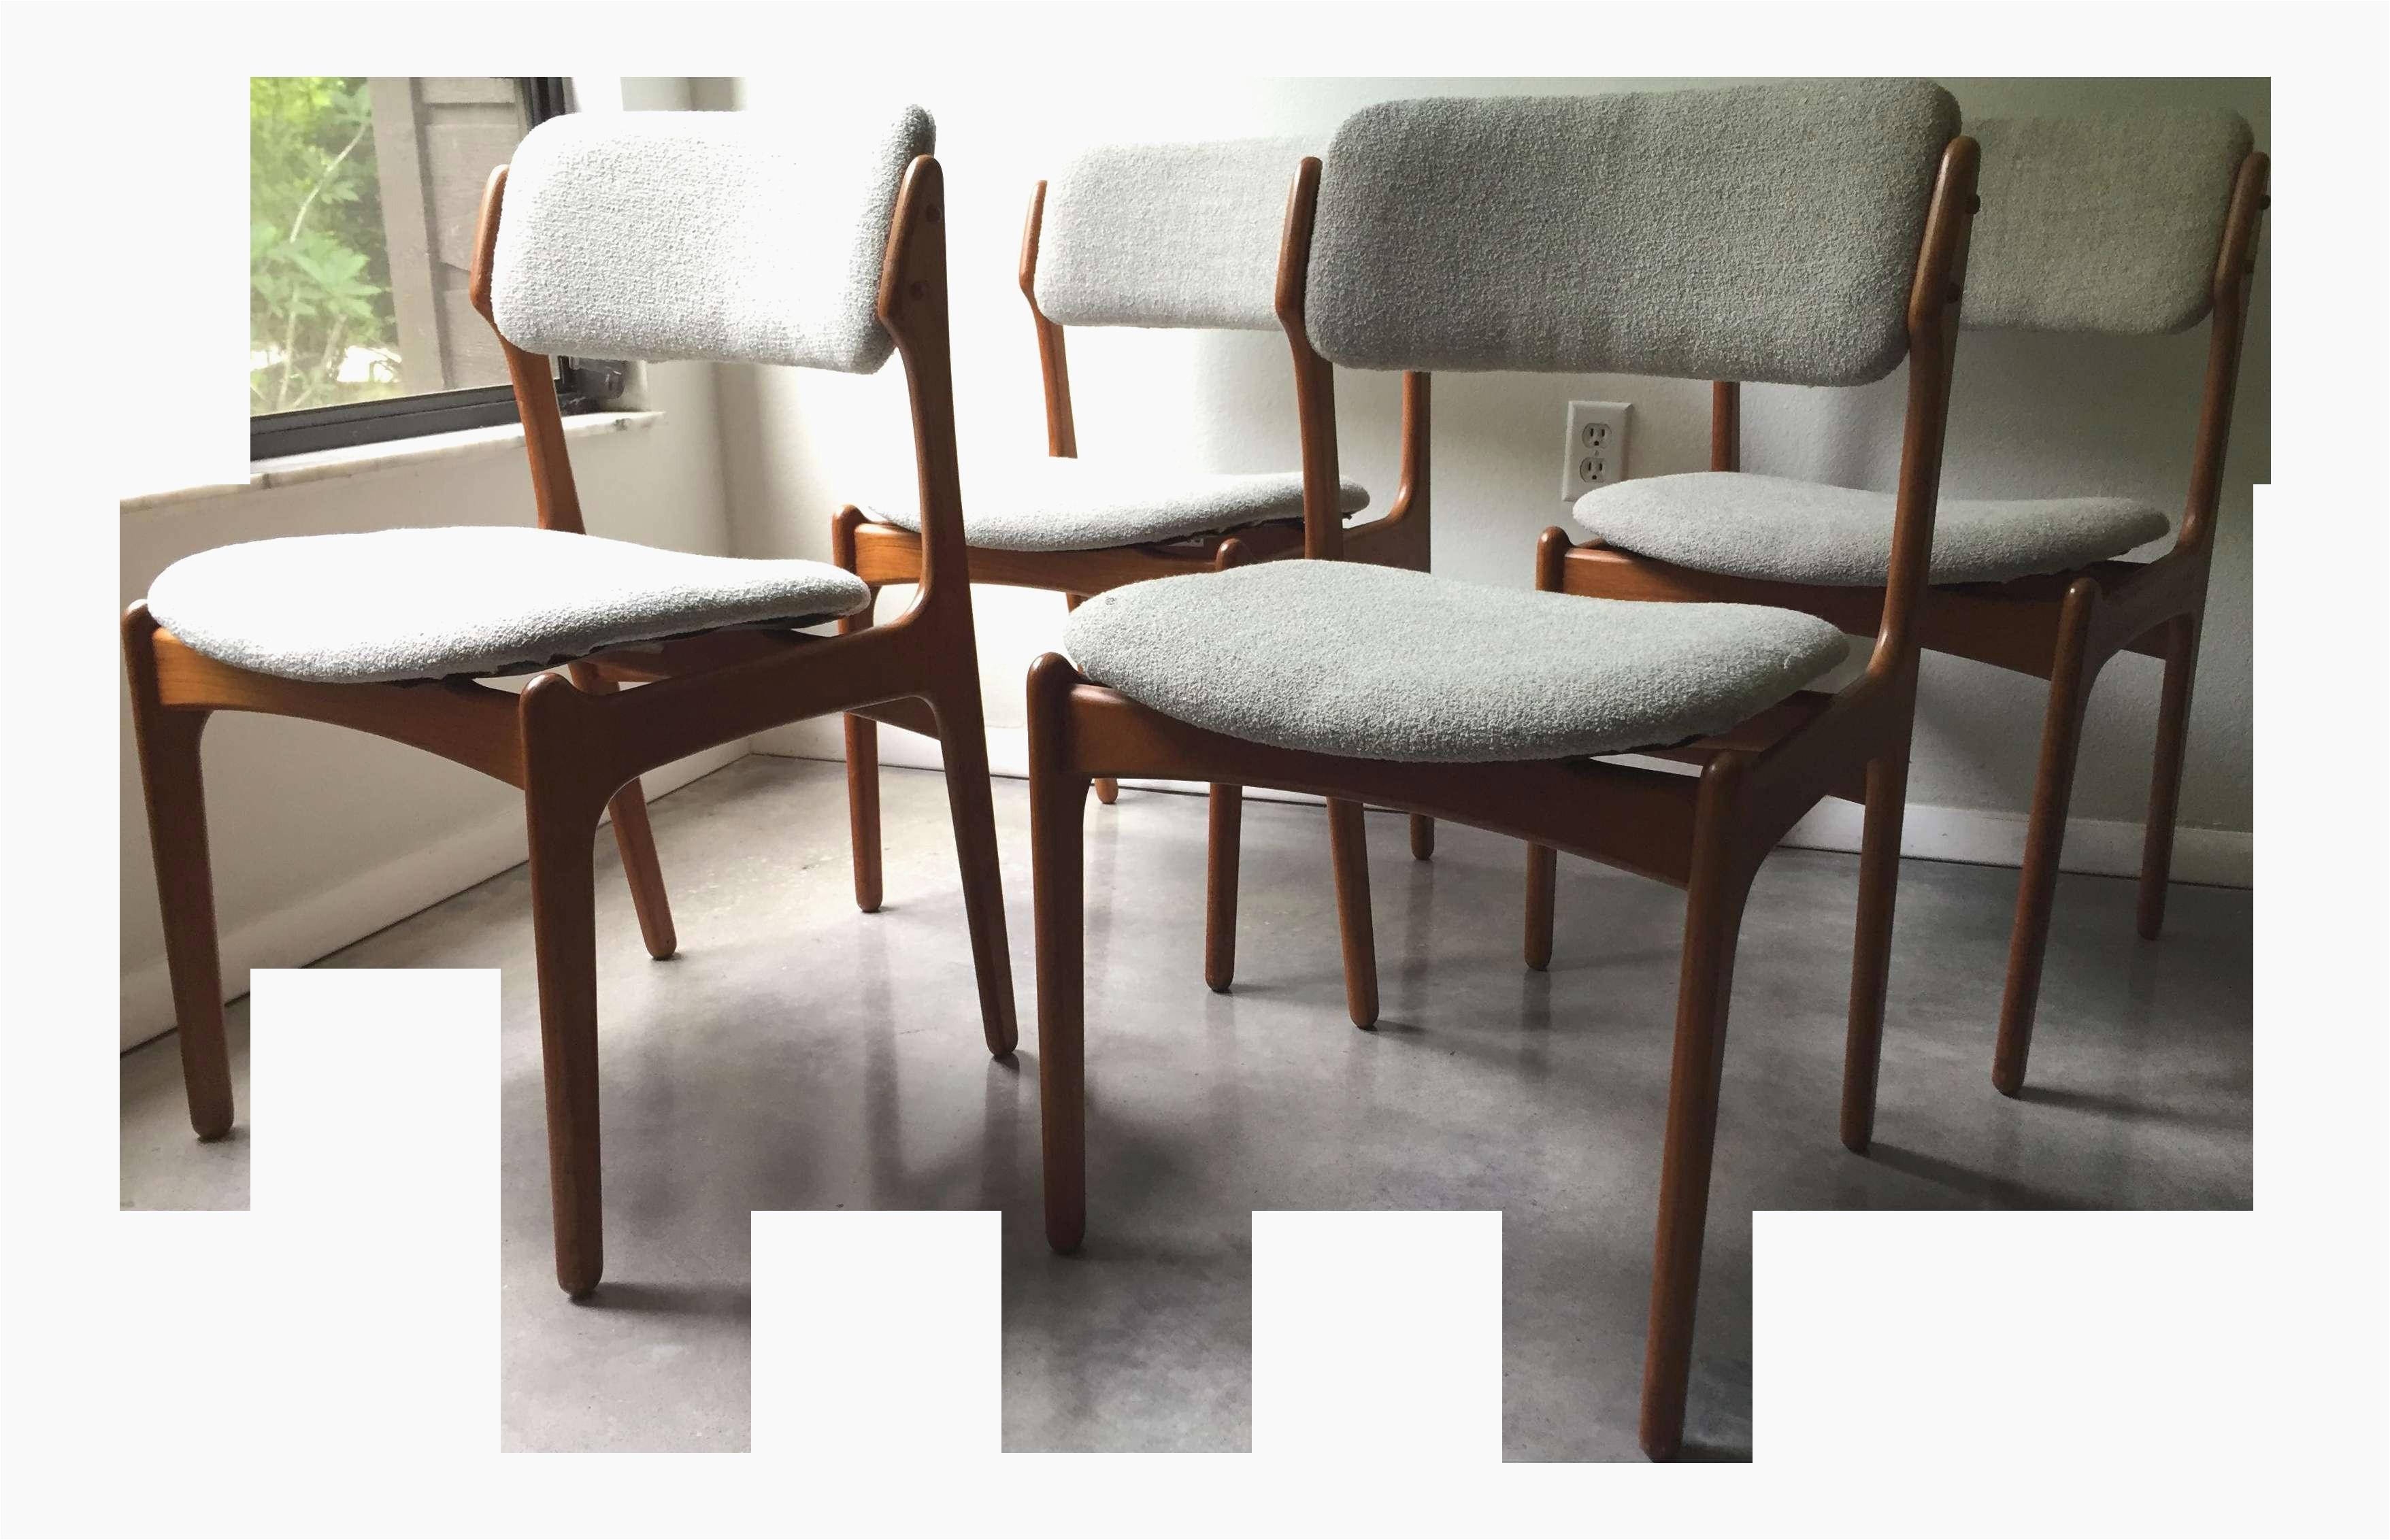 kitchen table bench seat luxury kitchen table set with bench seating luxury vintage erik buck o d